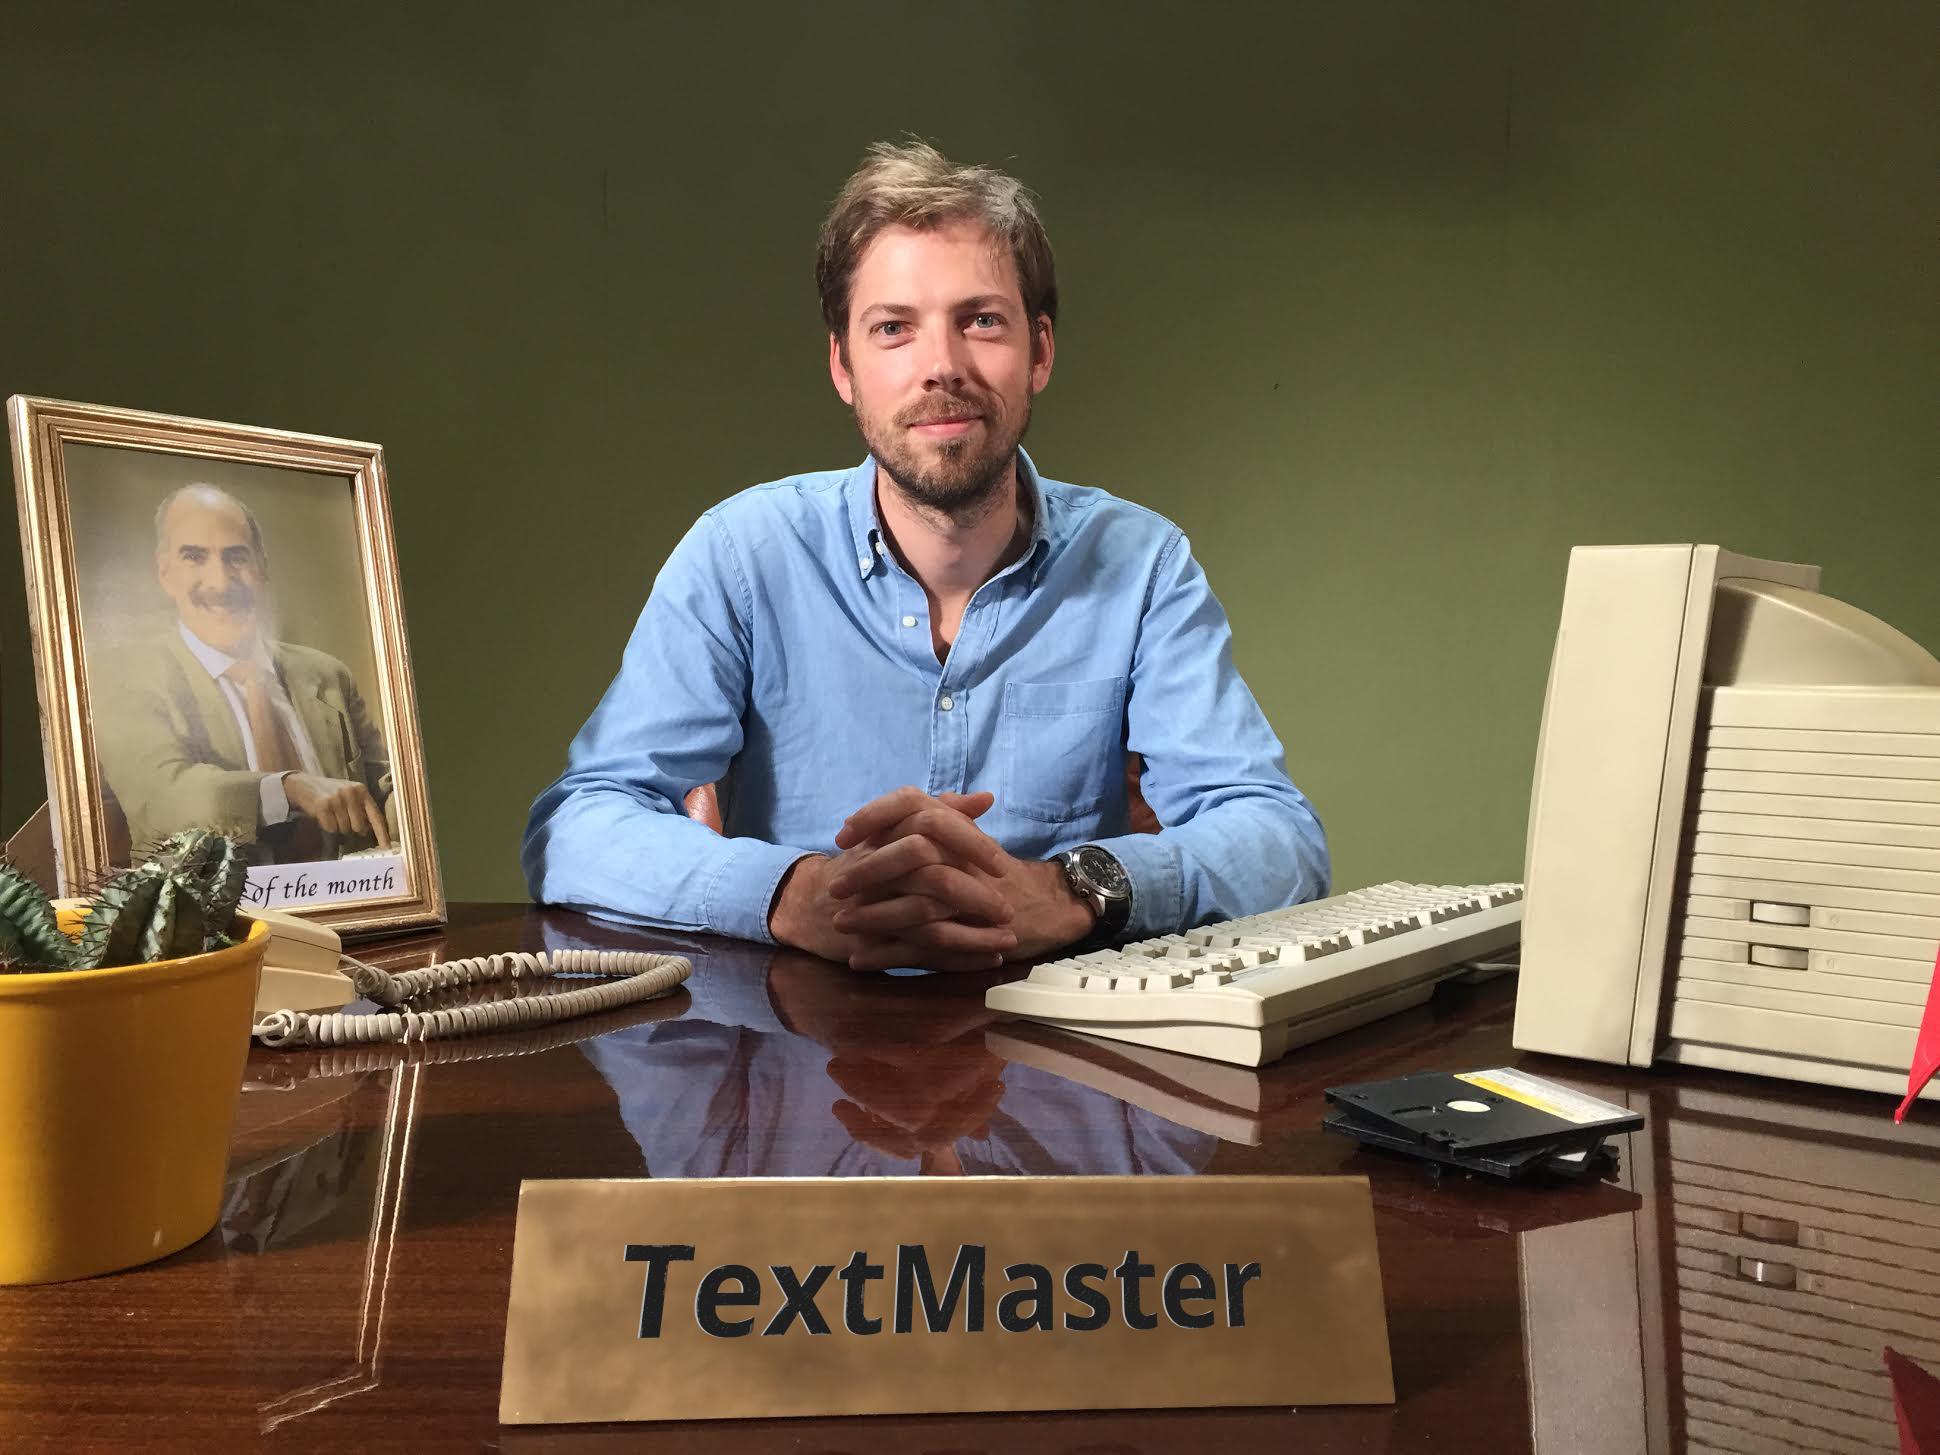 TR2000 Textmaster